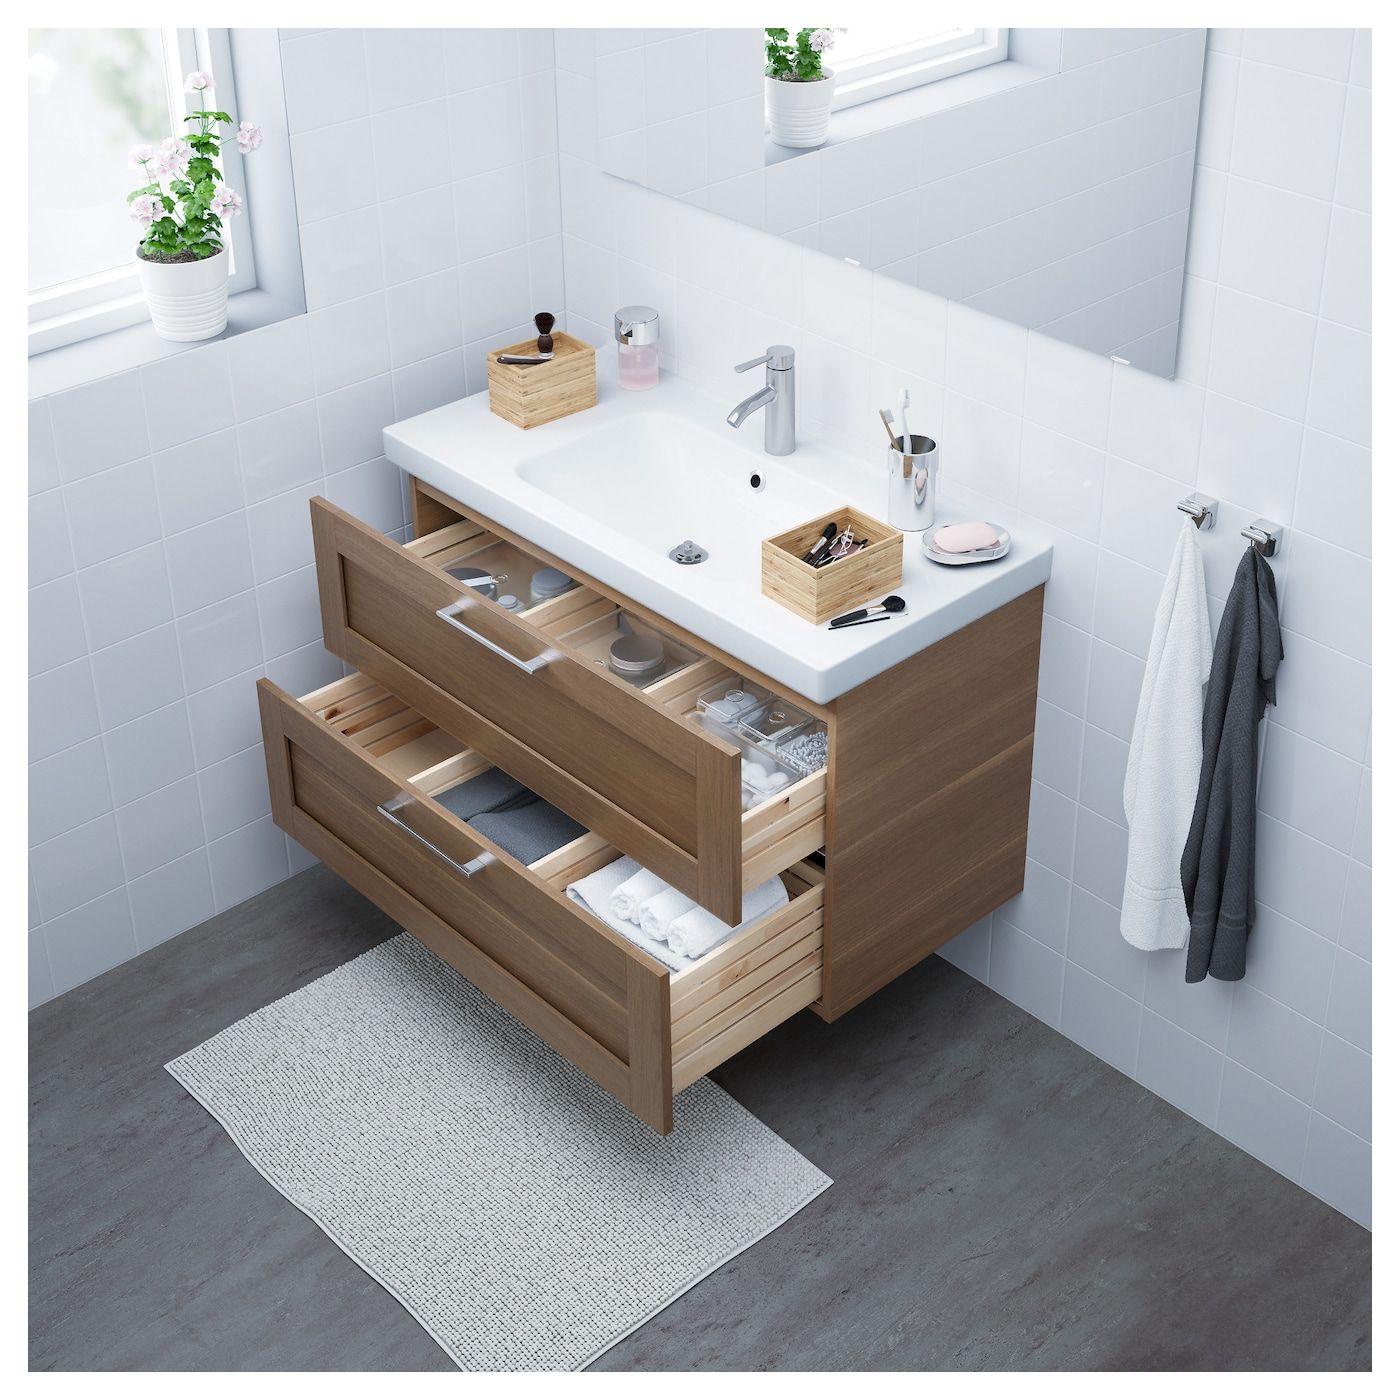 Ikea Godmorgon Odensvik Sink Cabinet With 2 Drawers Bathroom